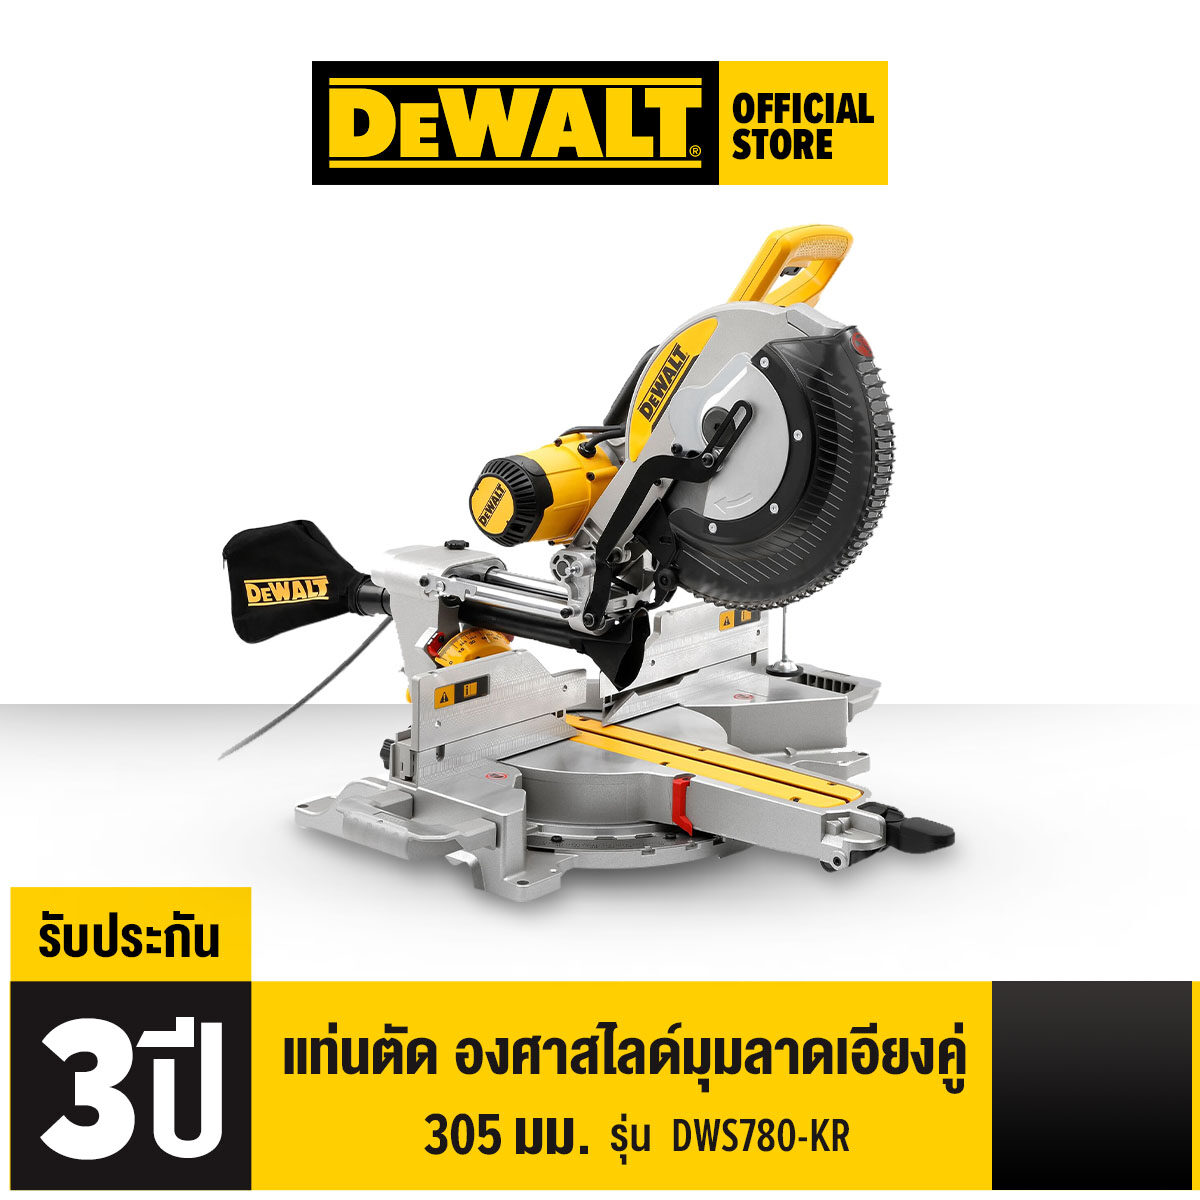 DEWALT แท่นตัด องศาสไลด์มุมลาดเอียงคู่ 305 มม. รุ่น DWS780-KR